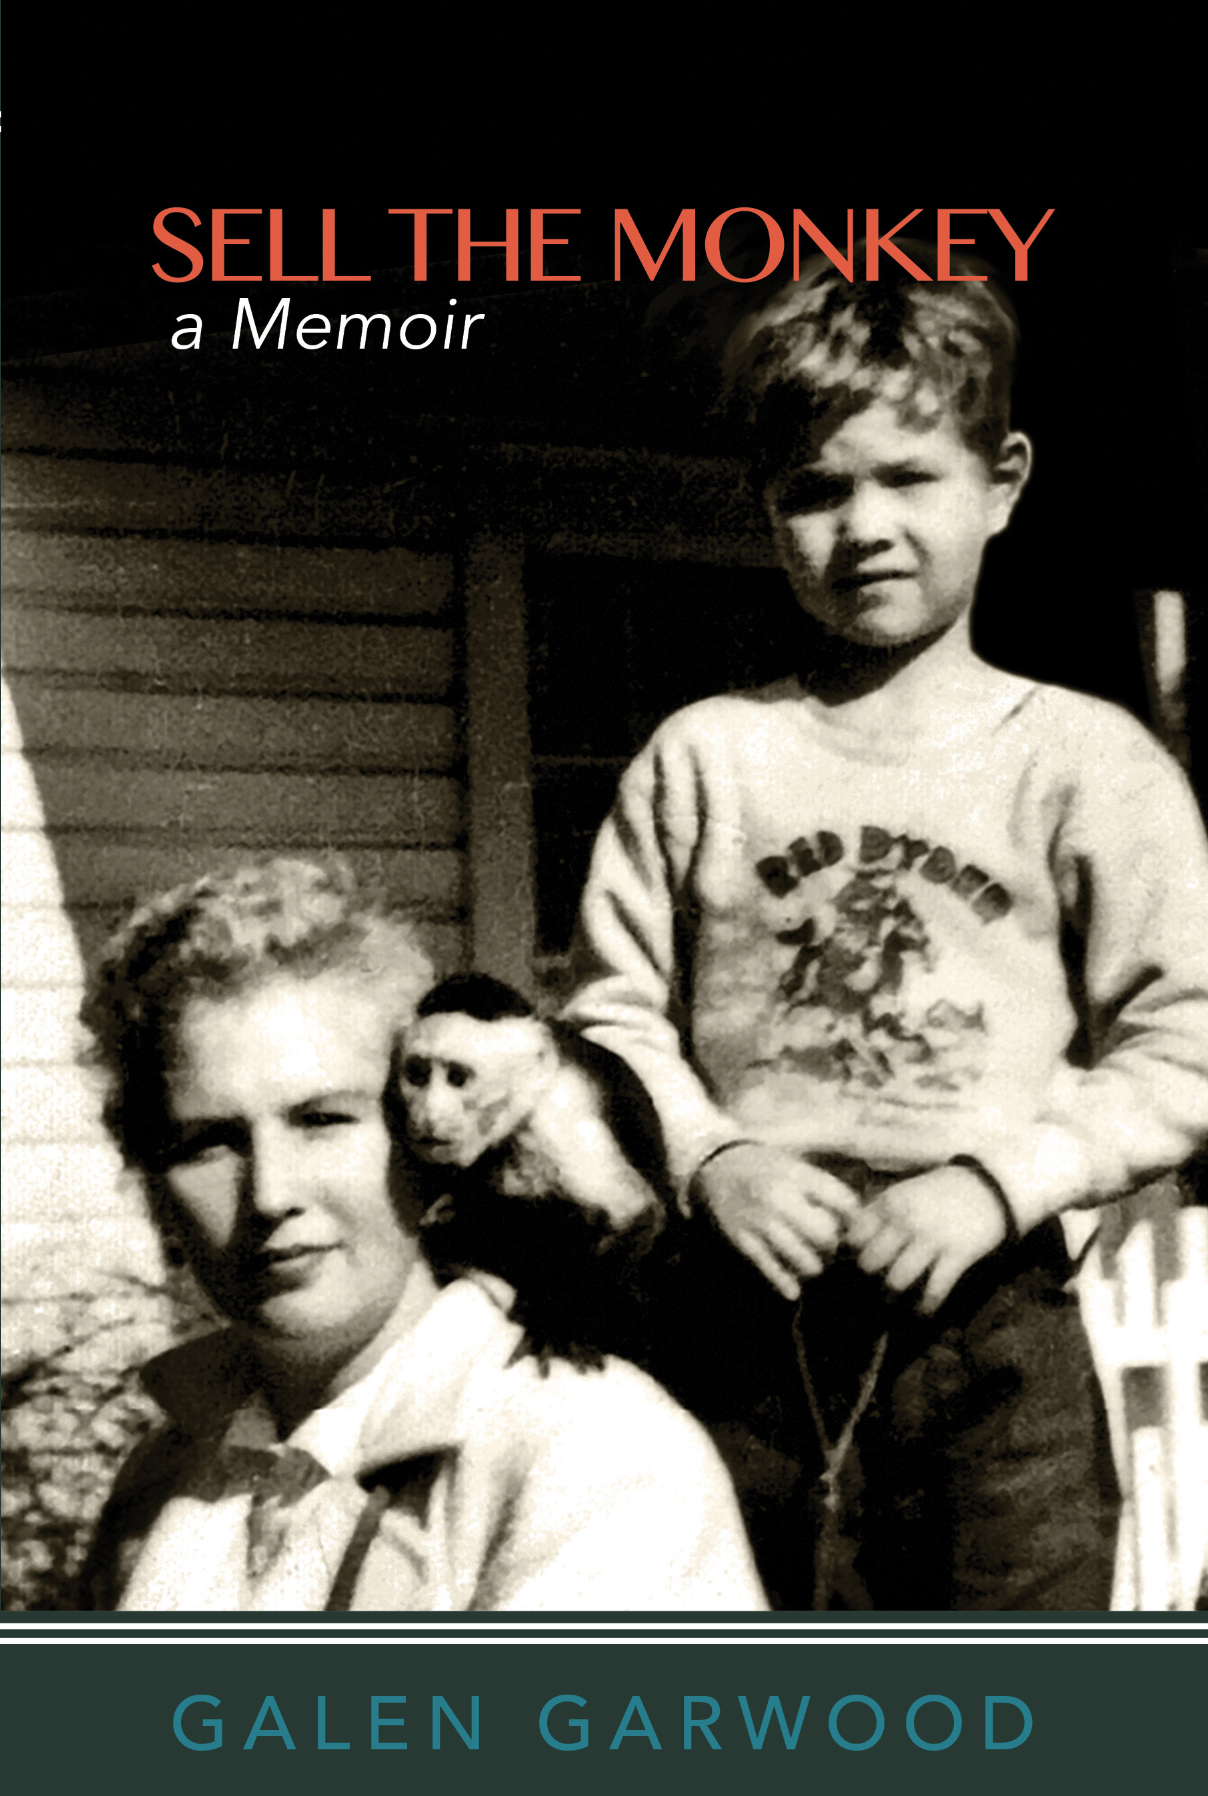 SELL THE MONKEY, A Memoir